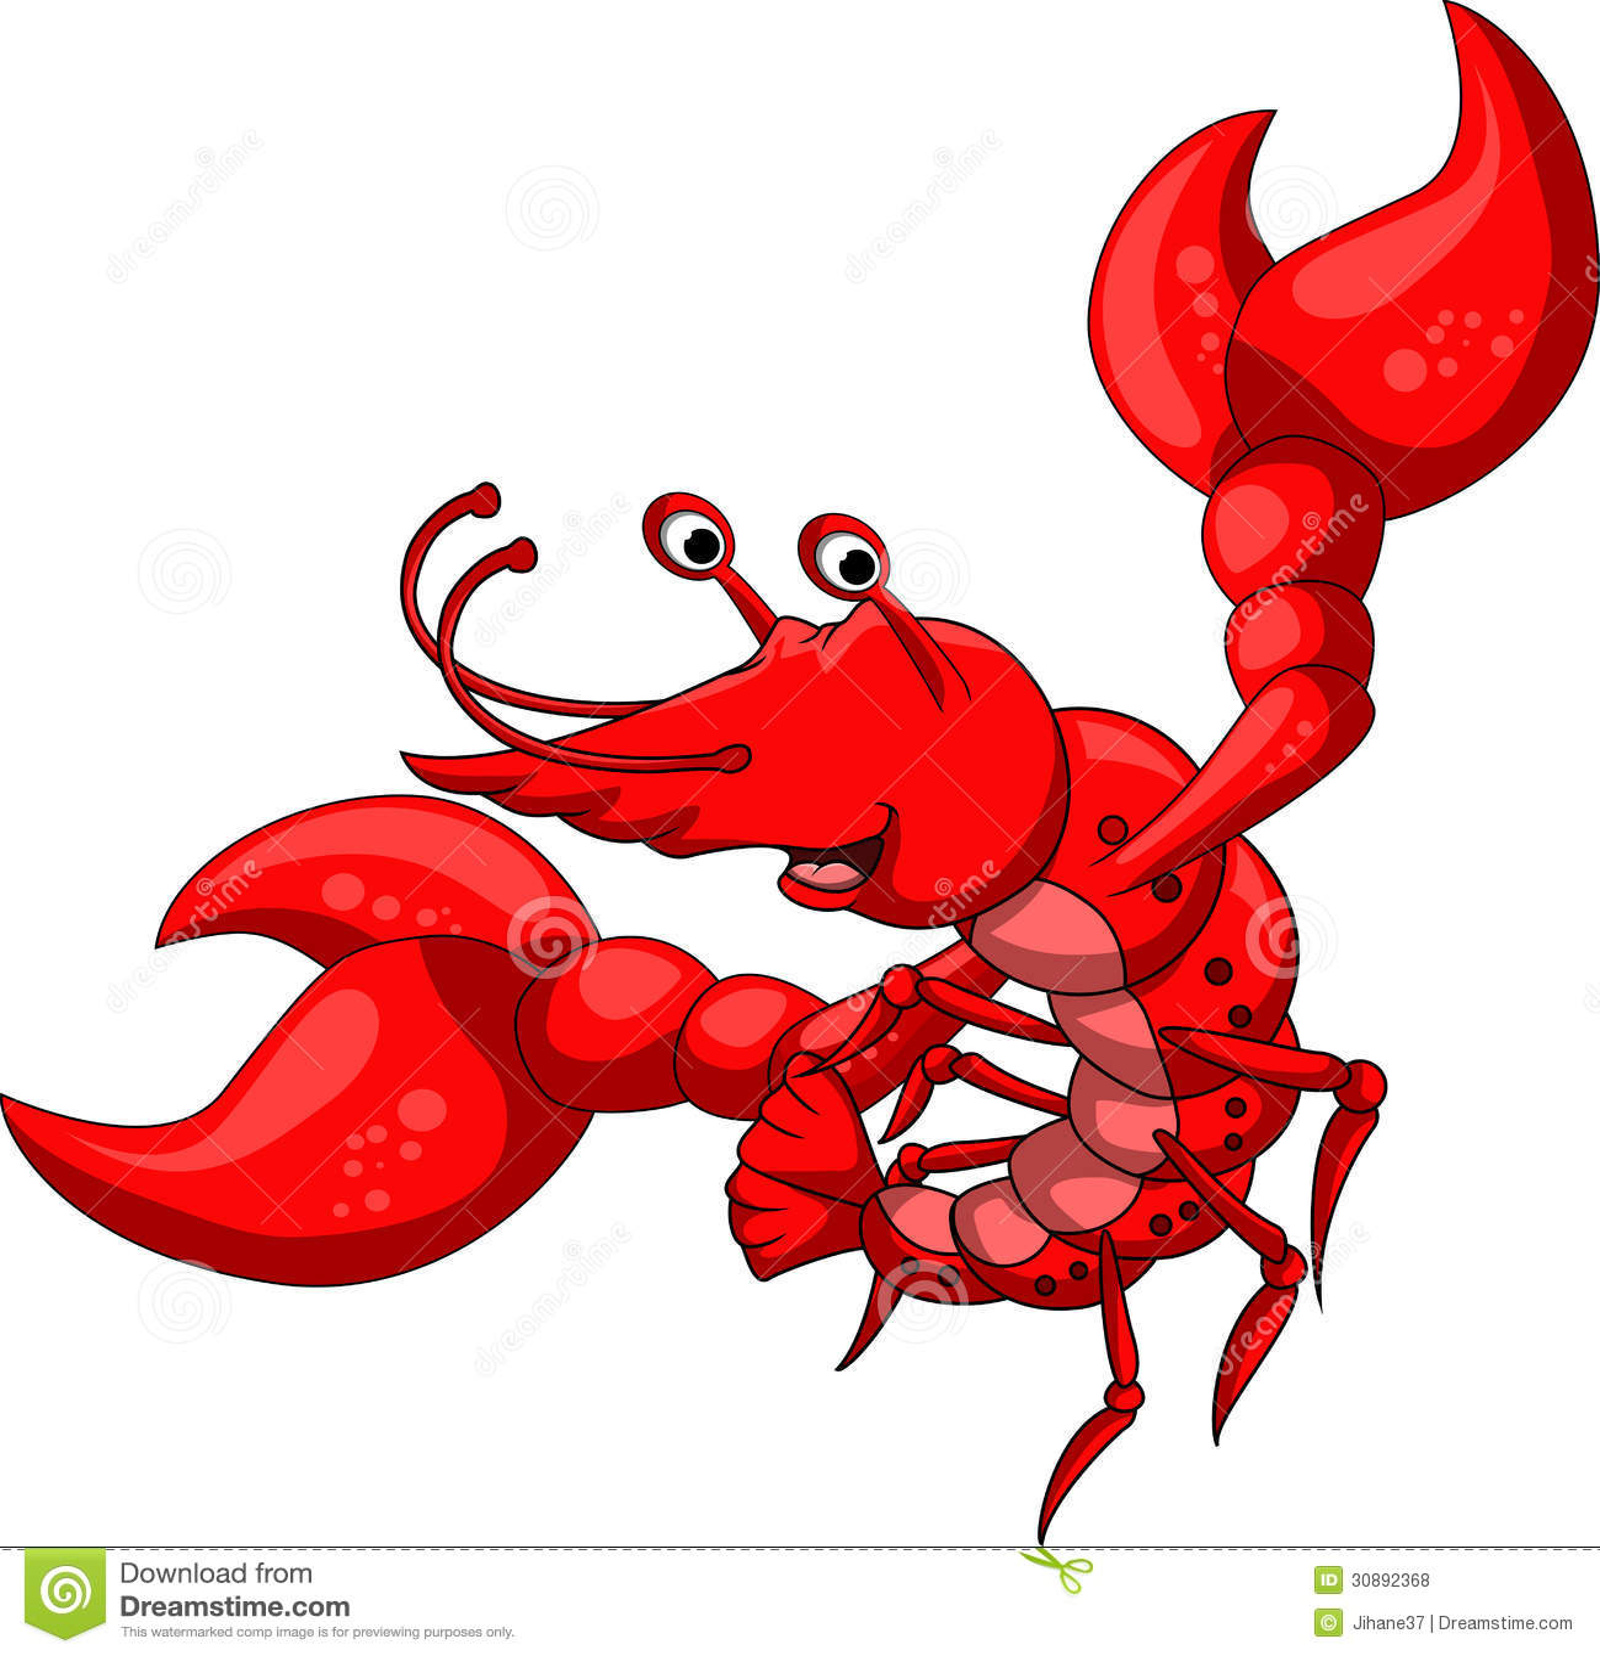 Red Shrimp Cartoon Royalty Free Stock Photos - Image: 30892368